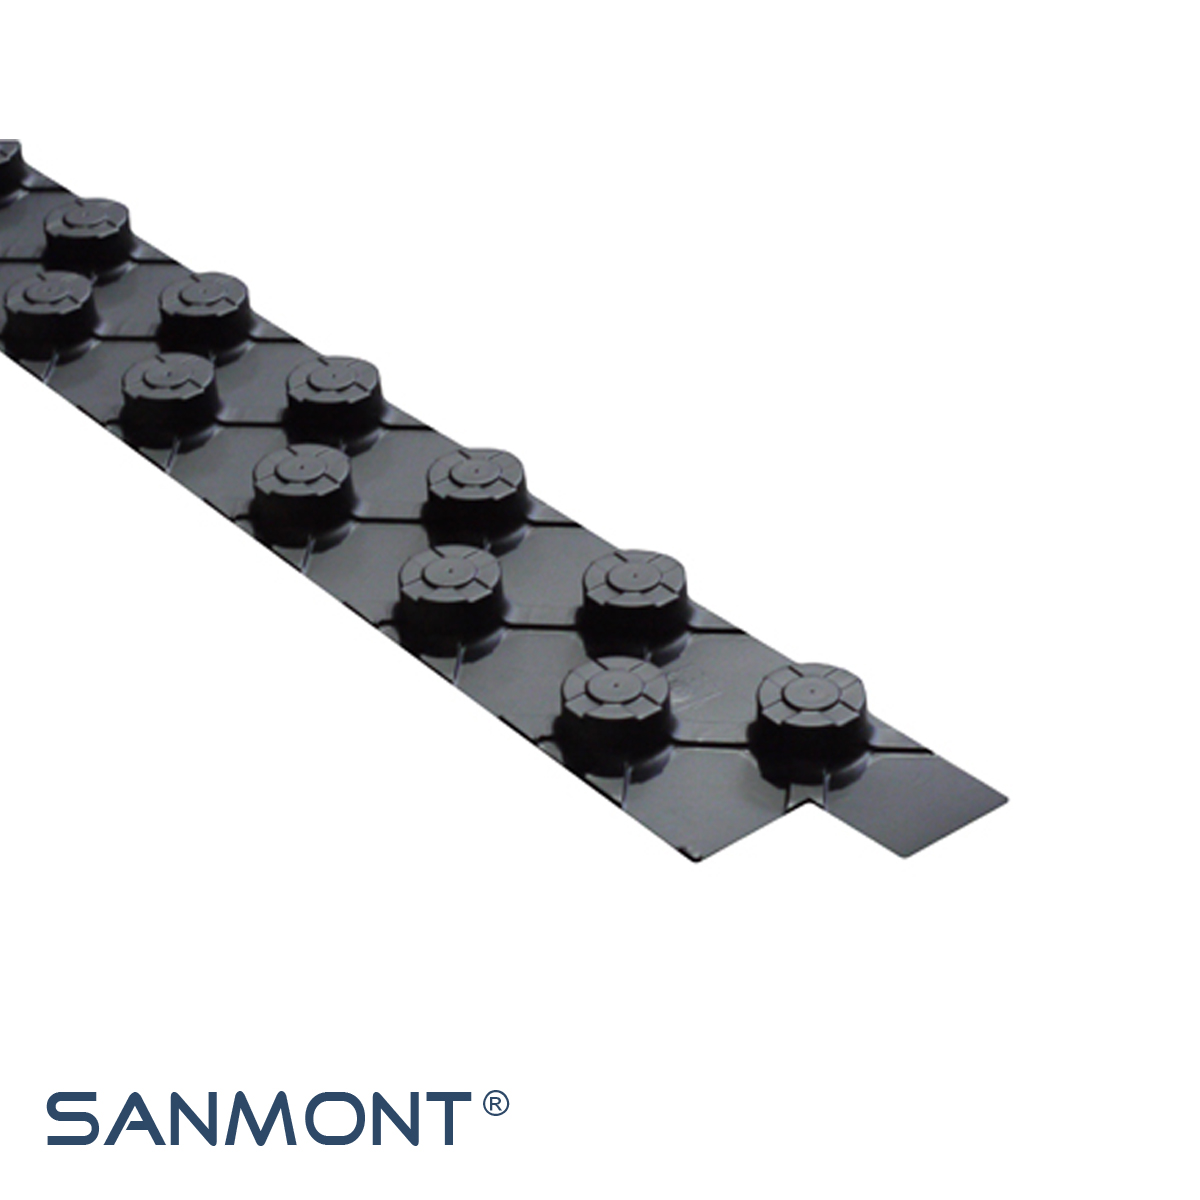 verbindungsstreifen sanmont shop heizk rper. Black Bedroom Furniture Sets. Home Design Ideas